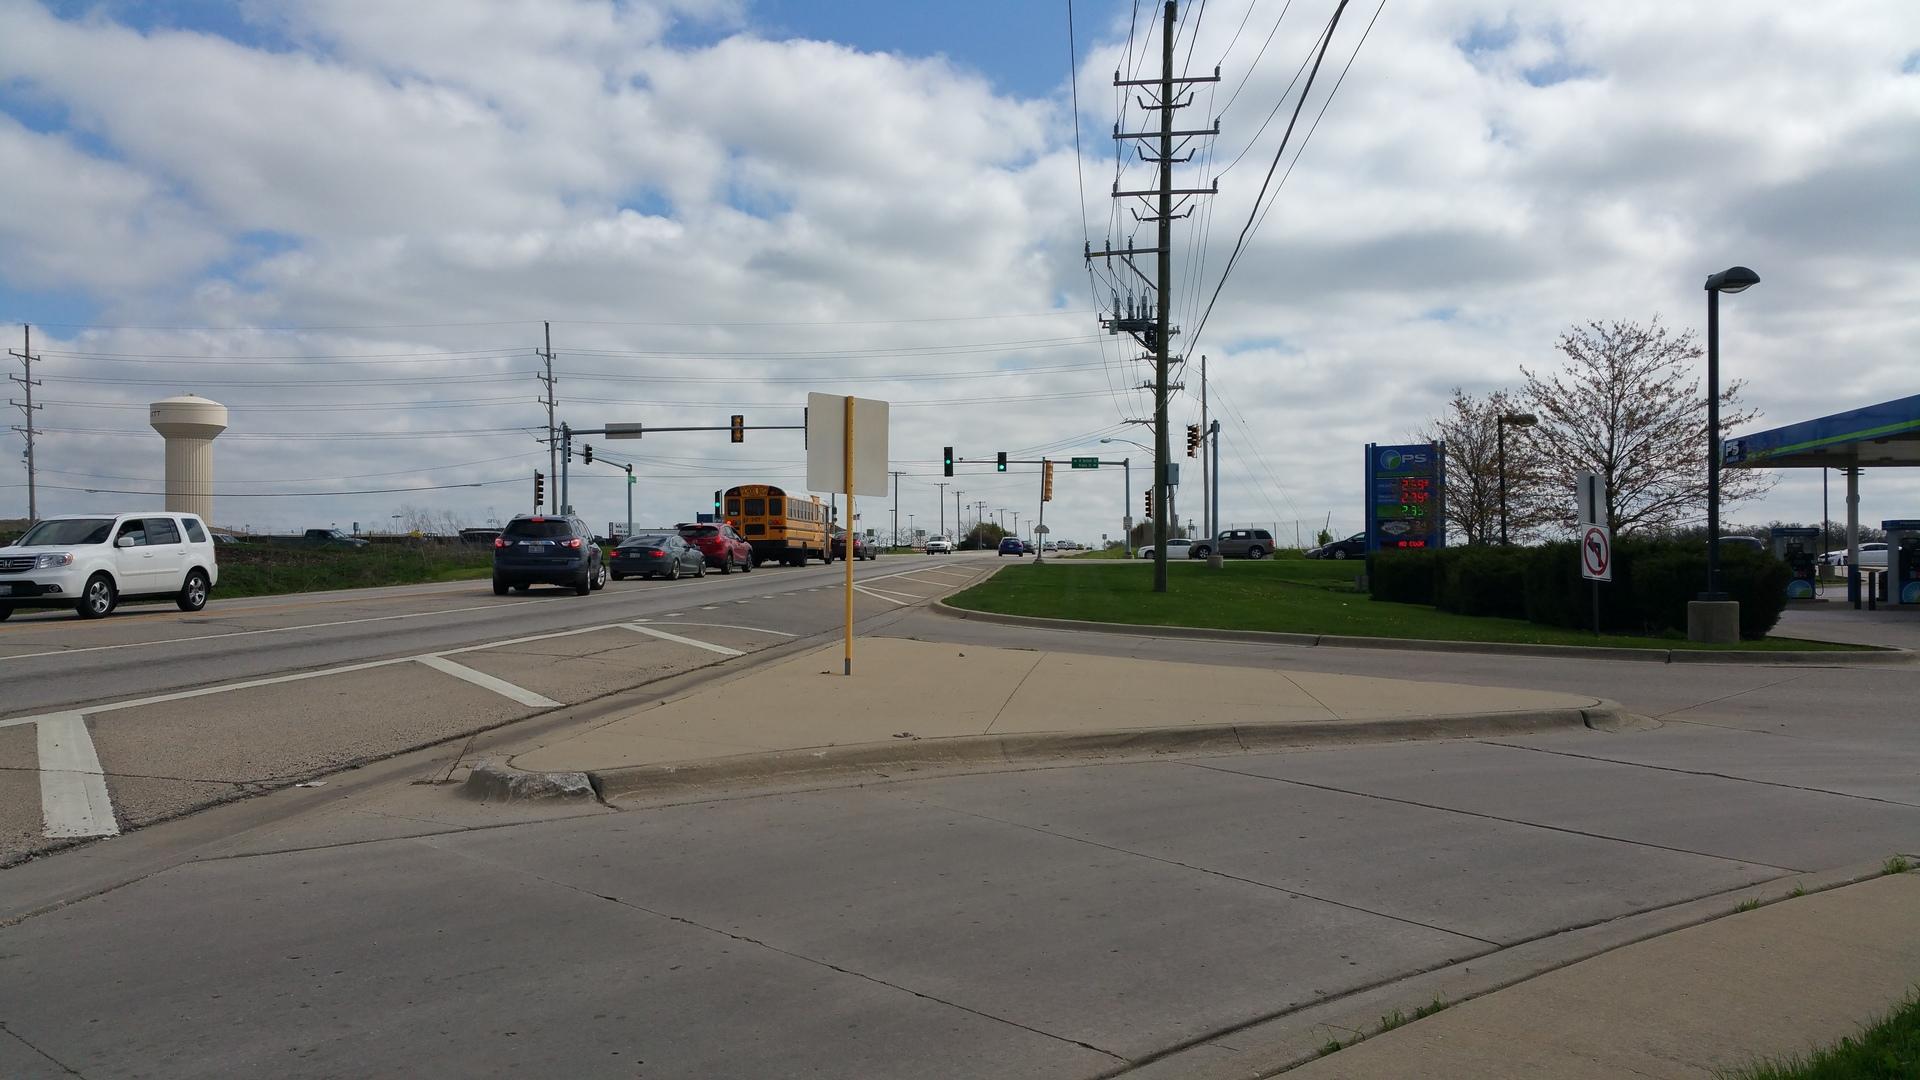 00 Route 25, South Elgin, IL 60177